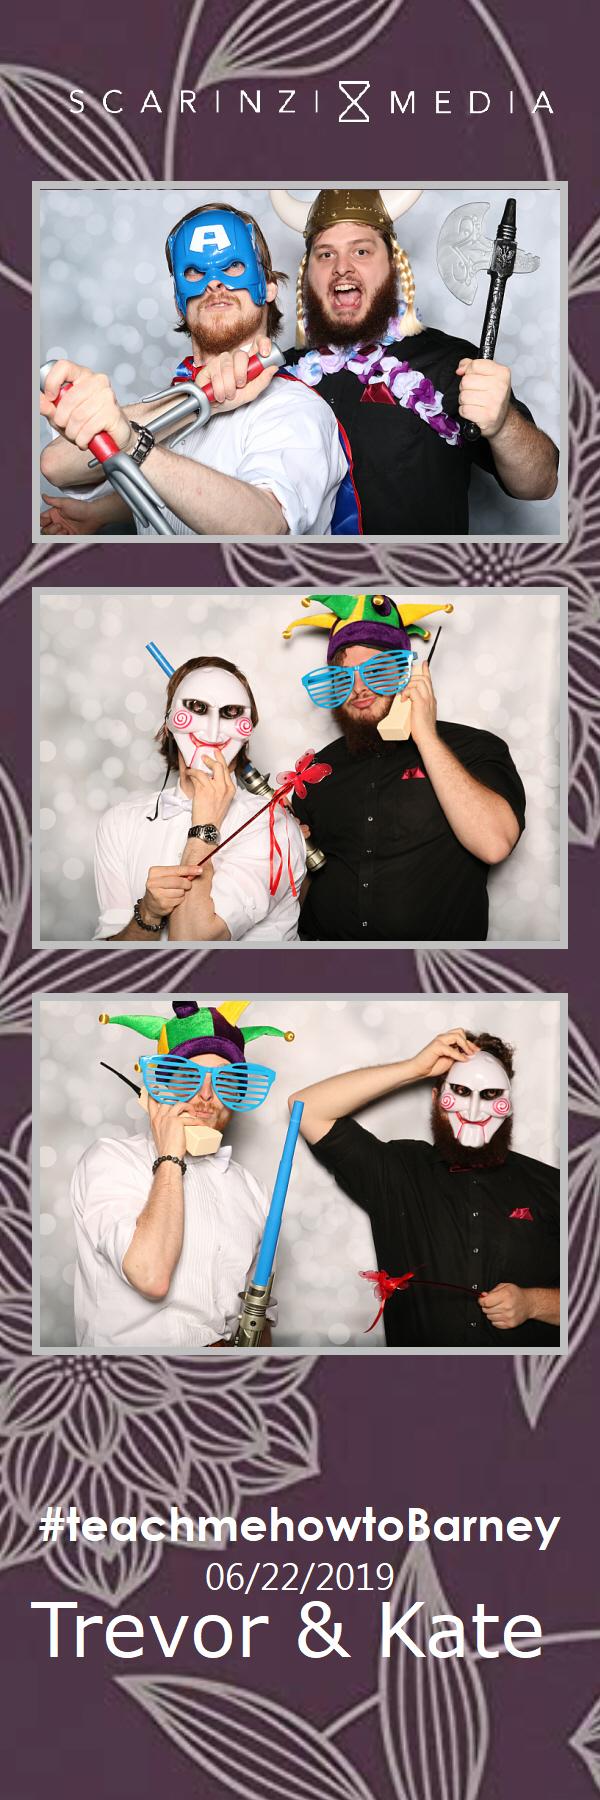 2019.06.22 - Barney Wedding PHOTOBOOTH28.jpg